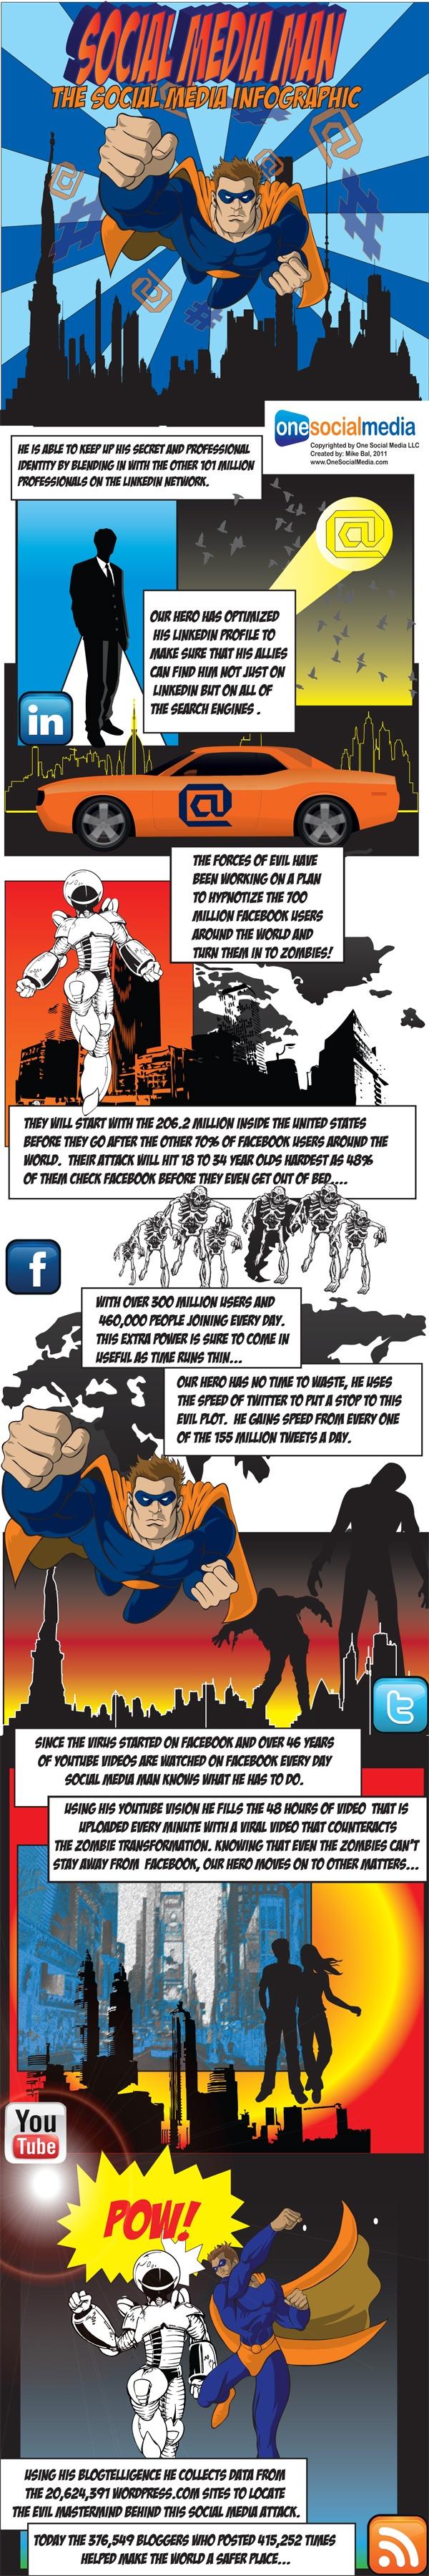 Social Media Man! (Infographic)   www.onesocialmedi...